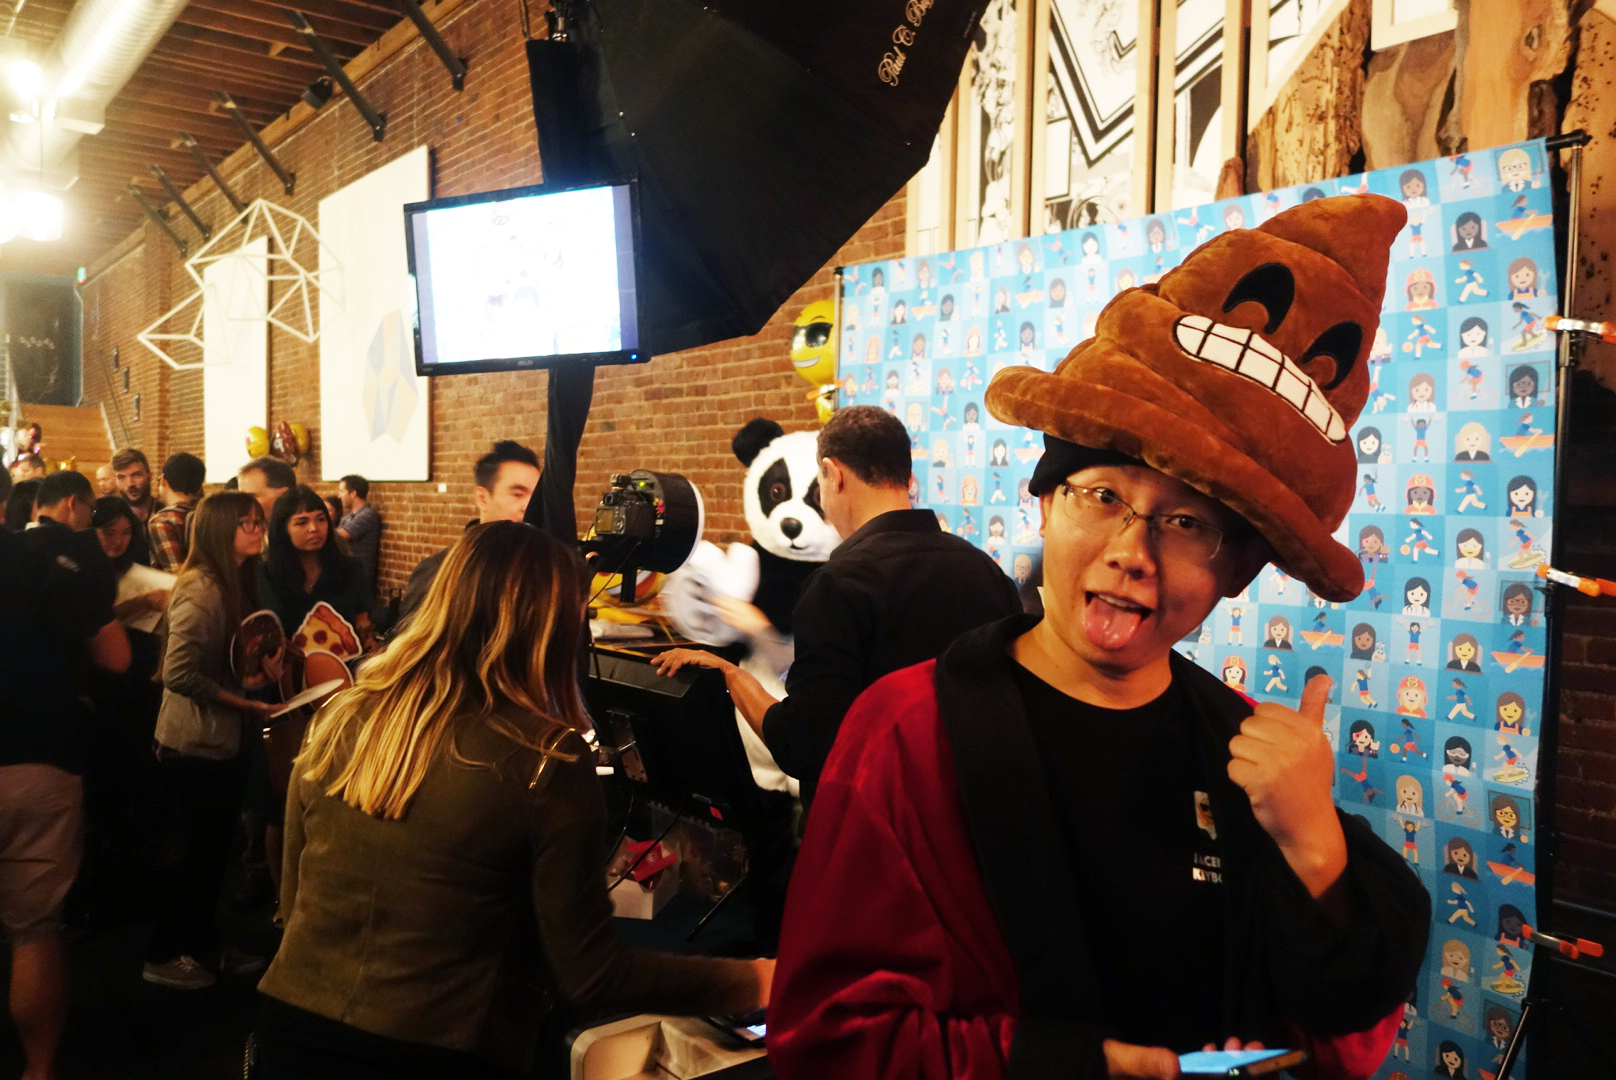 The first Emoji convention, Emojicon, held in San Francisco, CA on Nov. 4, 2016.